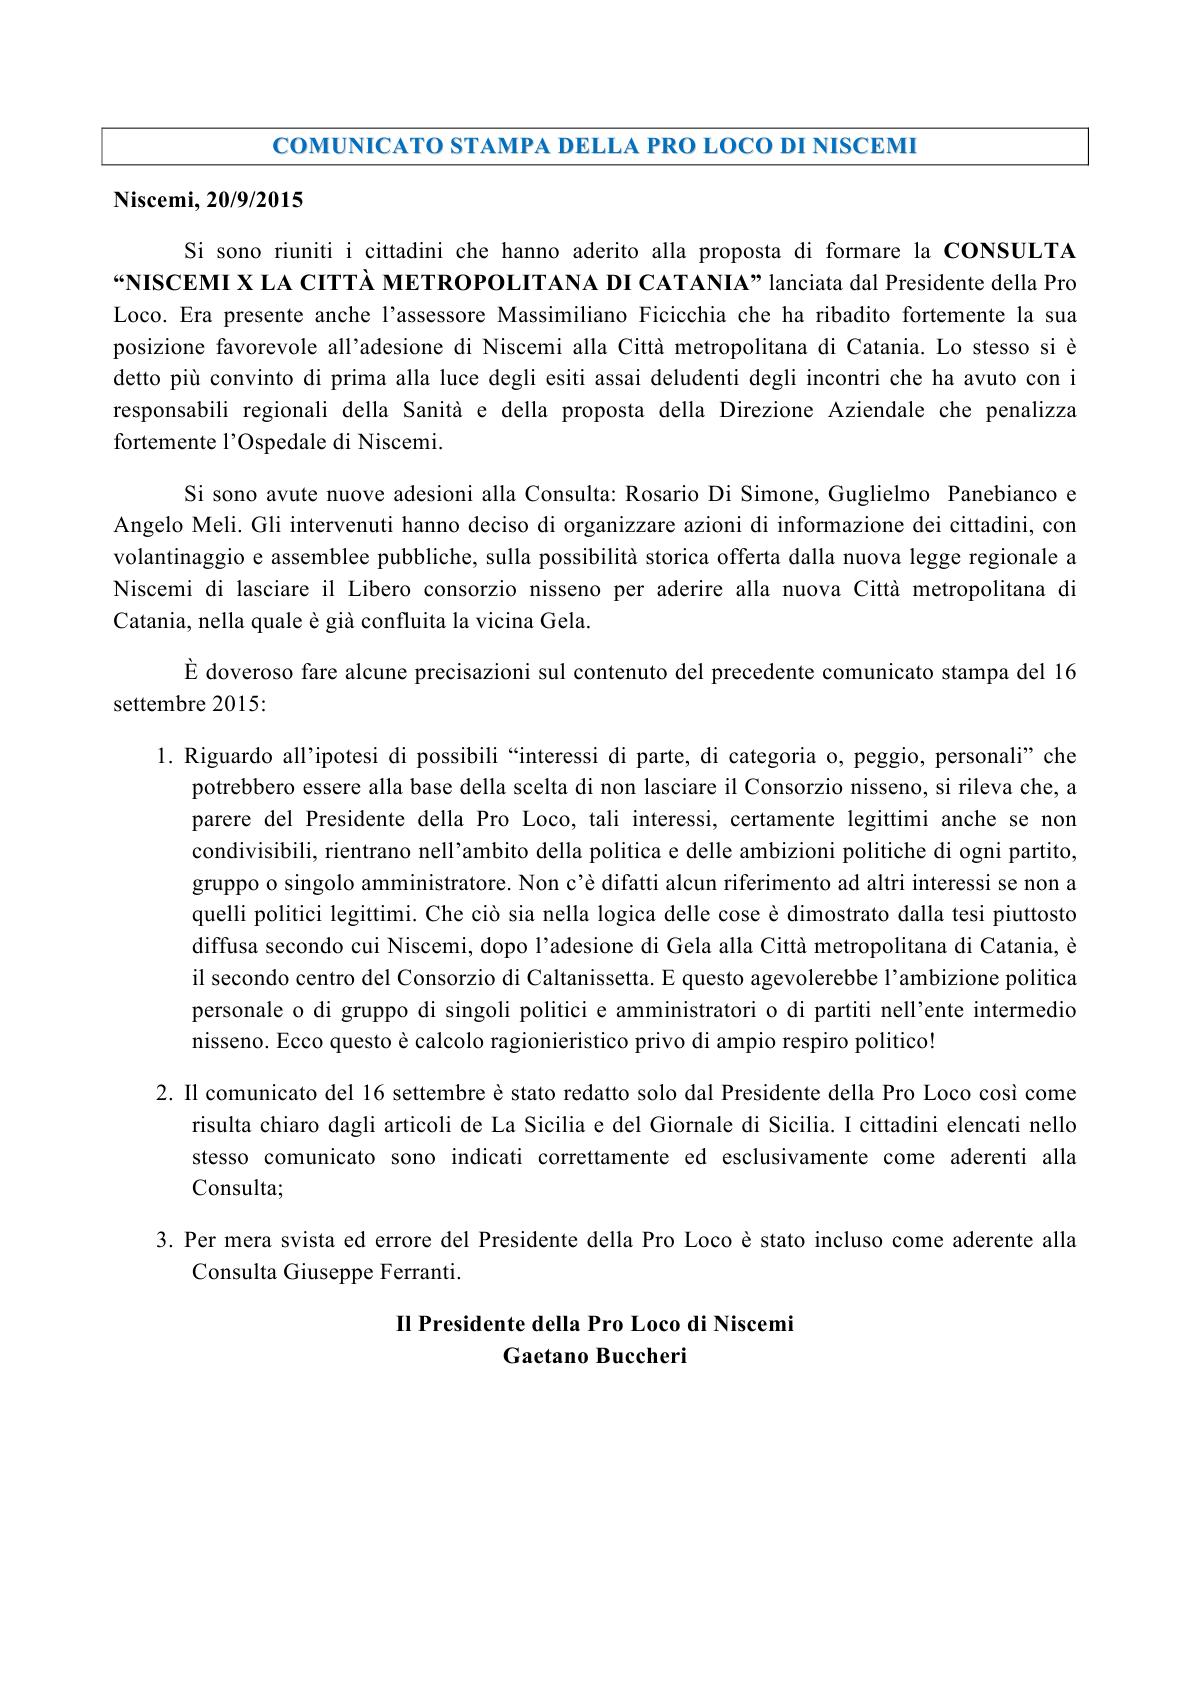 Pro_Loco_Città_Metropolitana_Comunicato_20_Sett_2015